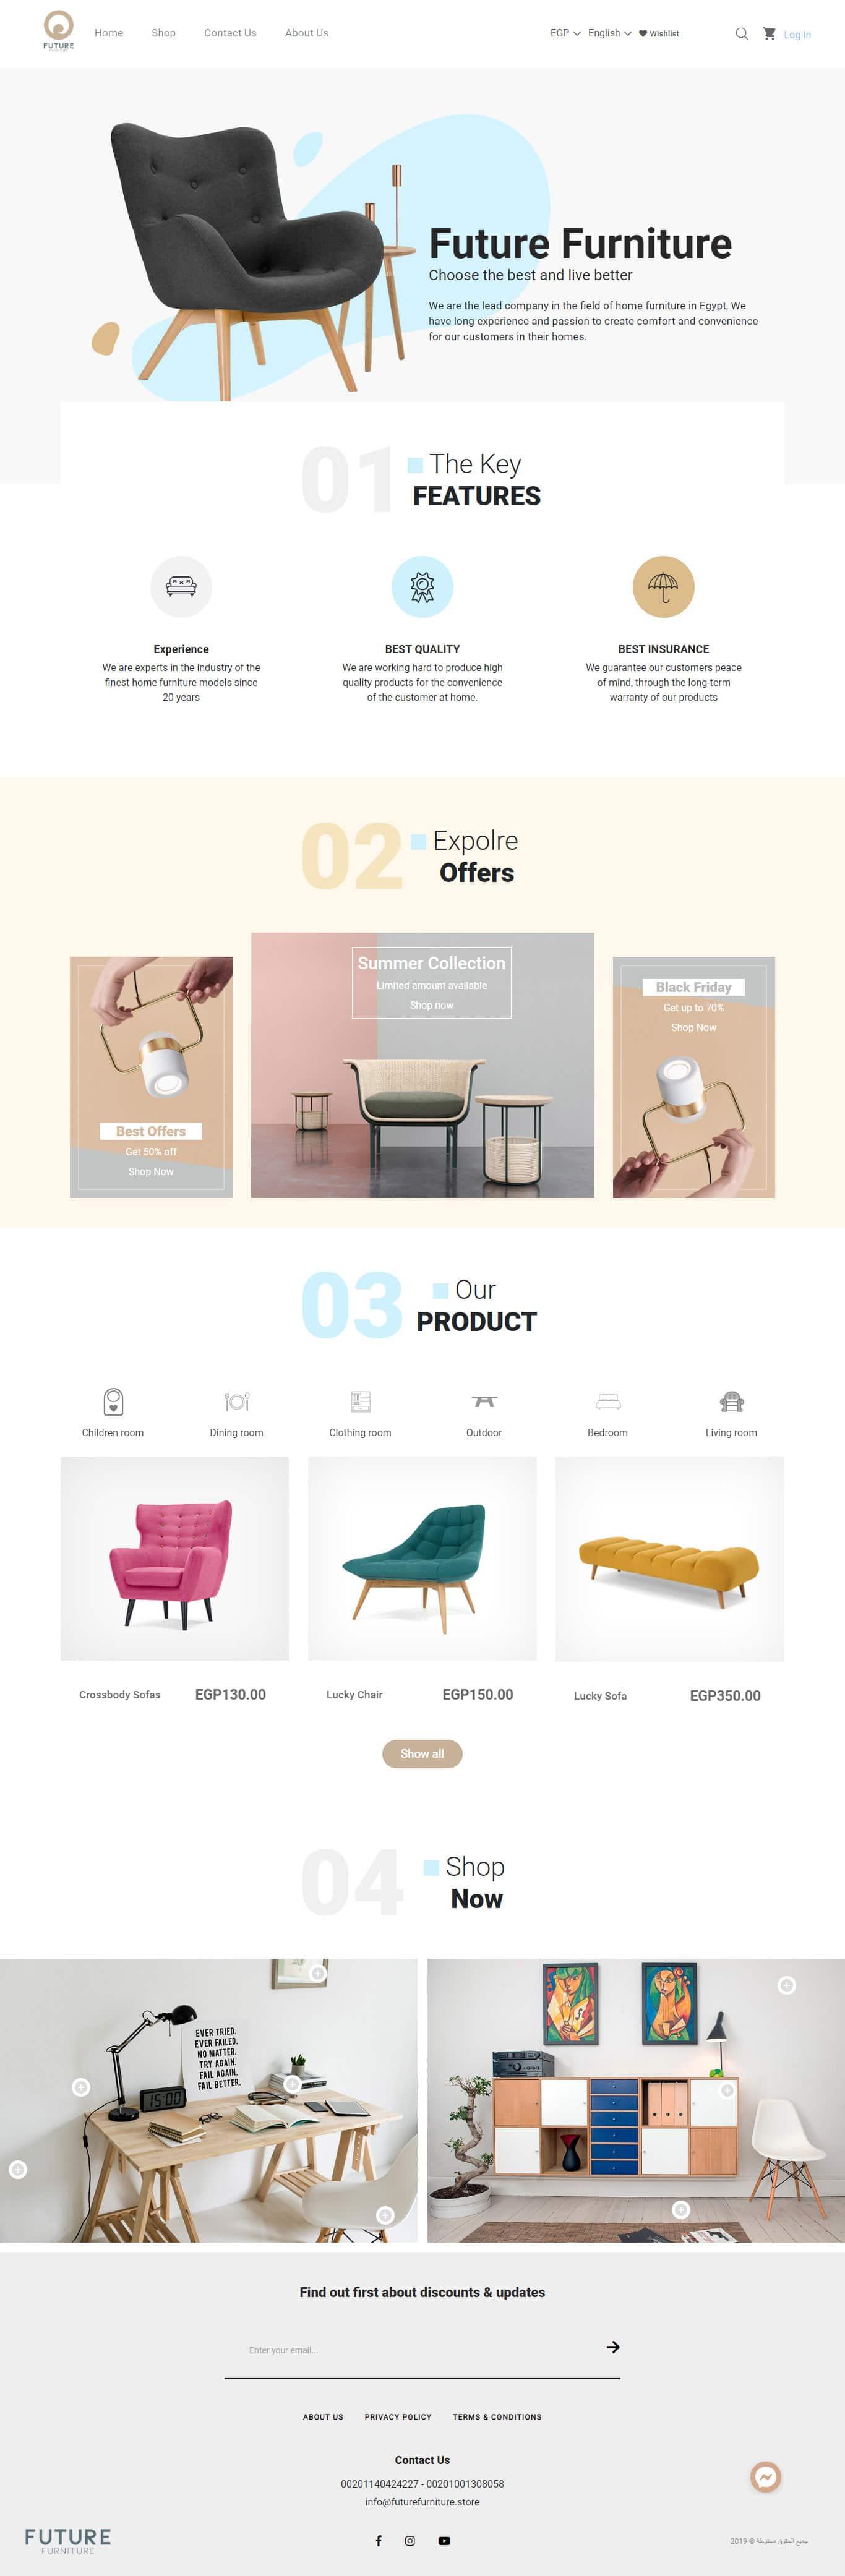 Future Furniture E-eCommerce website desktop optimized in Turnsole portfolio